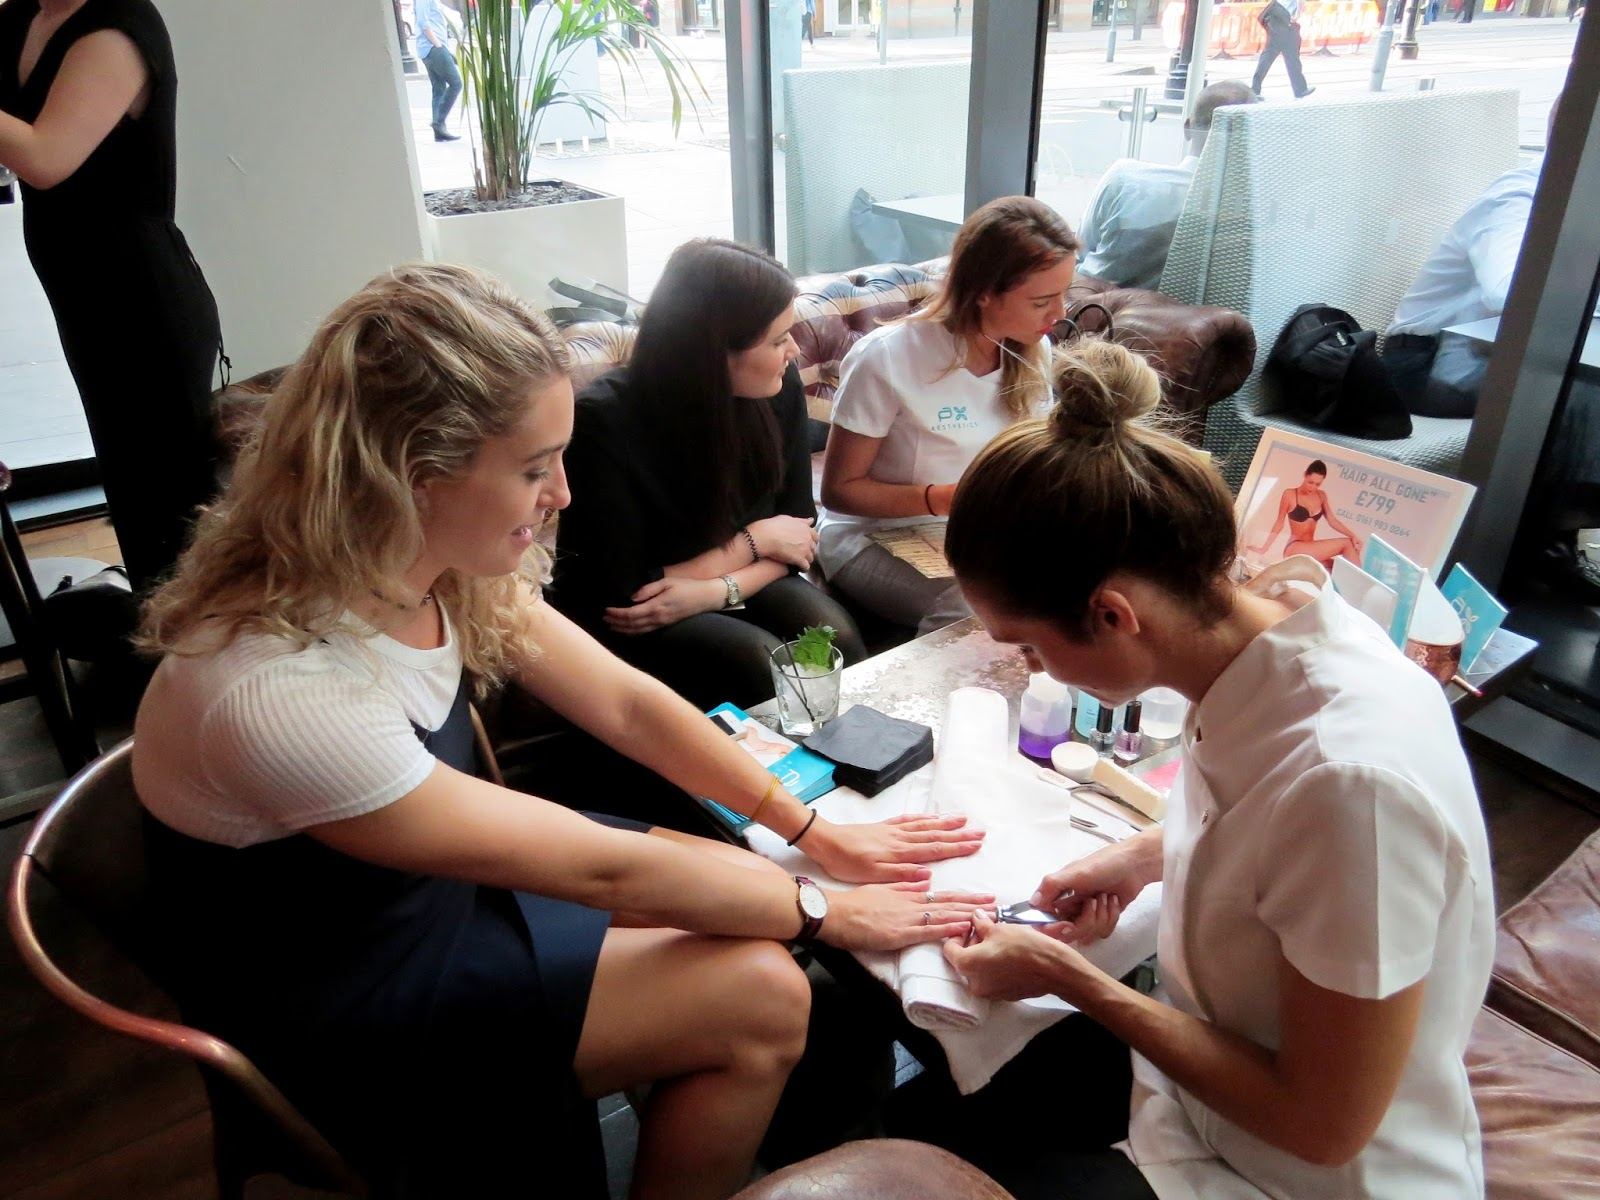 hairdresser offers Pierre Alexandre Aesthetics